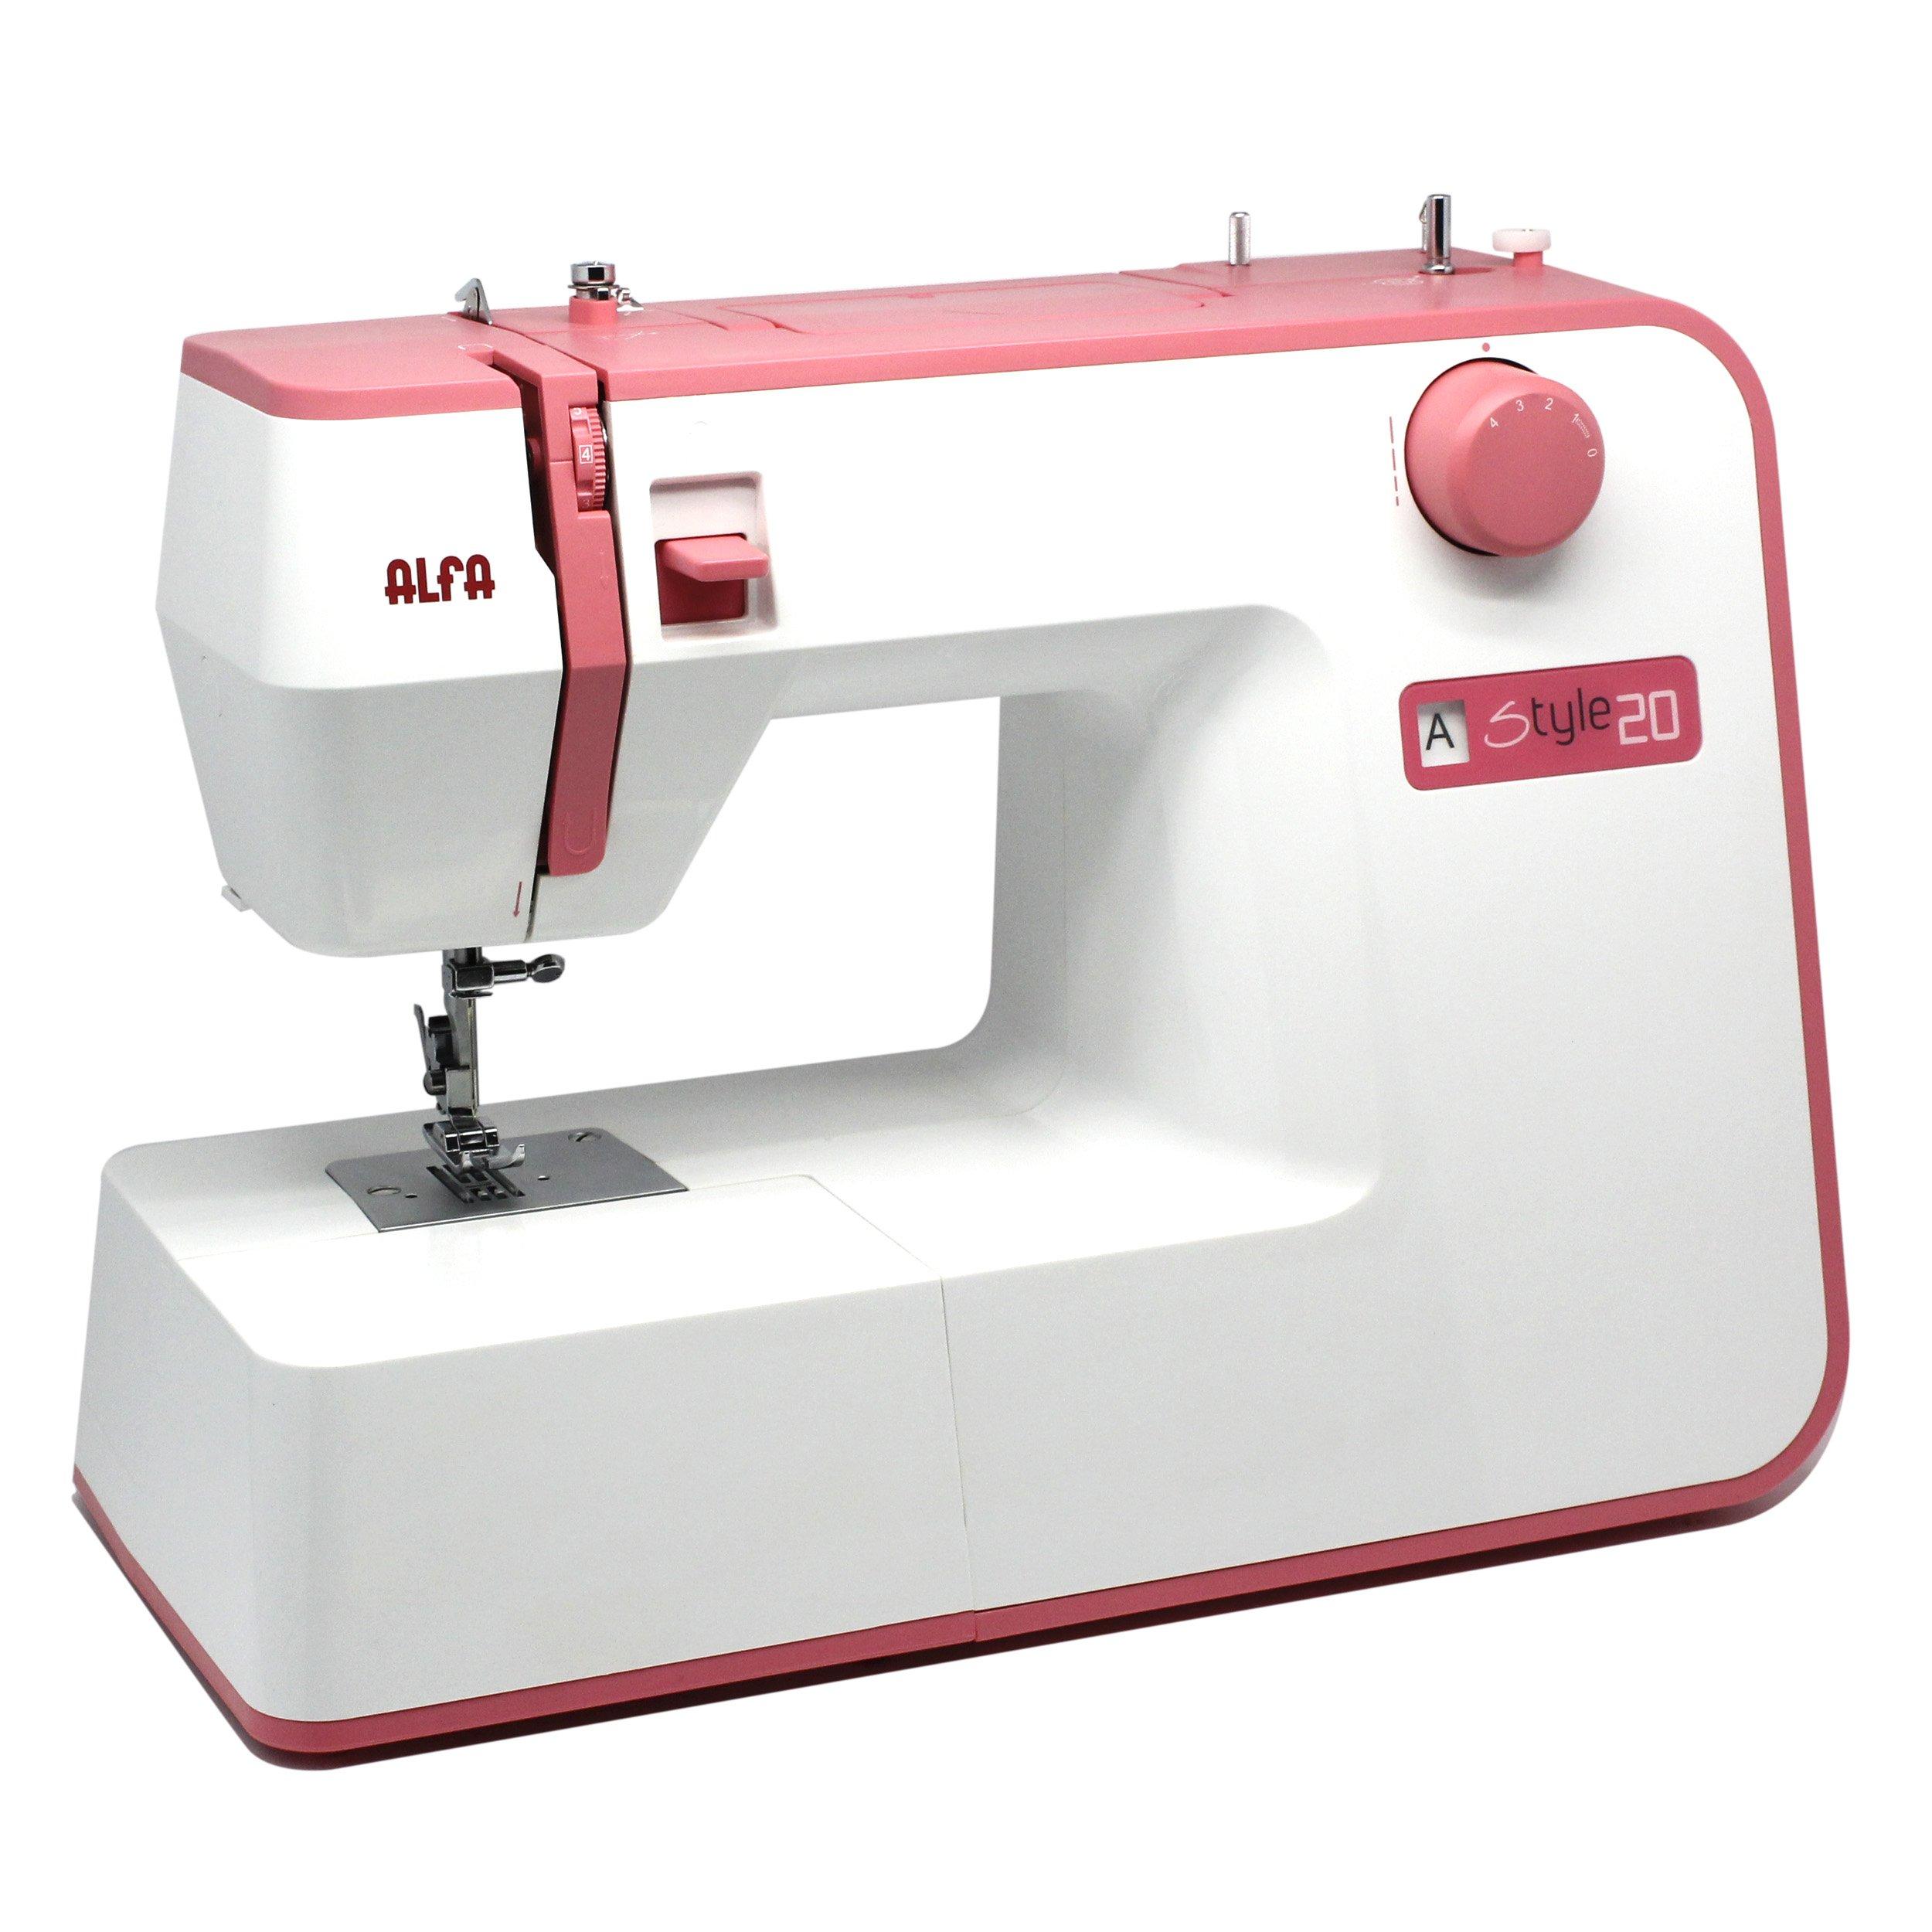 Alfa Style 20 - Máquina de Coser, Color Rosa product image